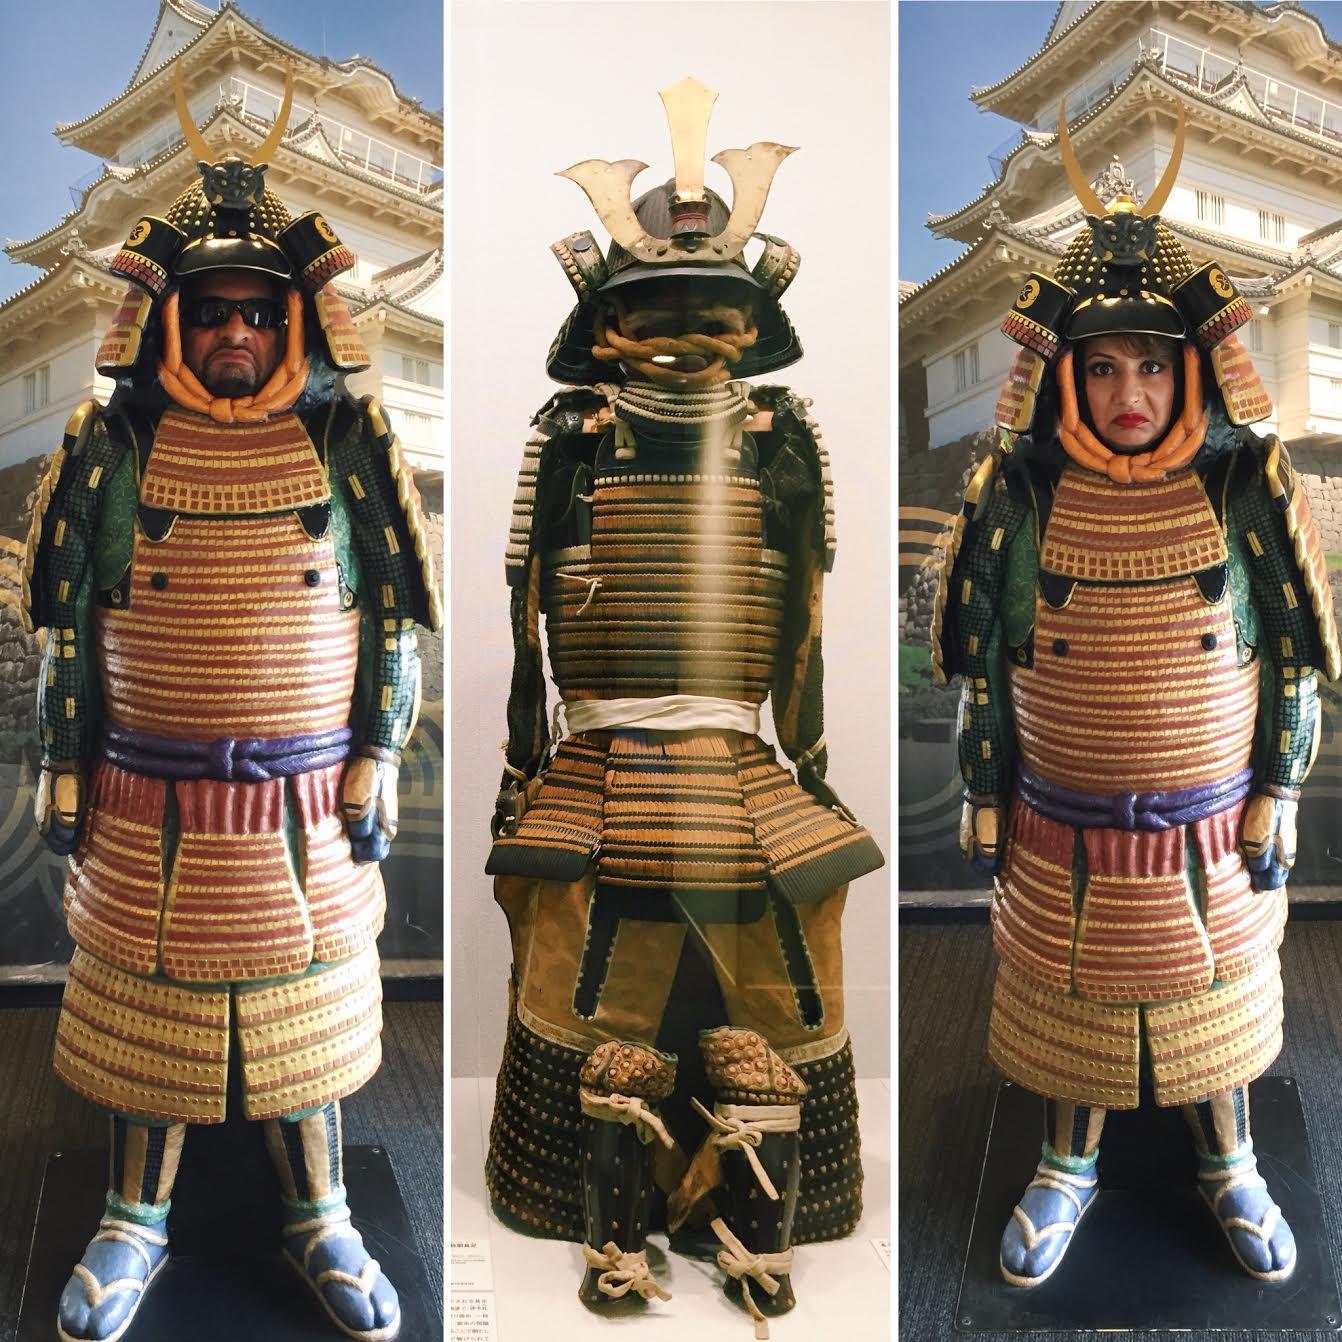 Muslim-travel-Hakone-Japan-Odawara-Castle-exhibit.jpg